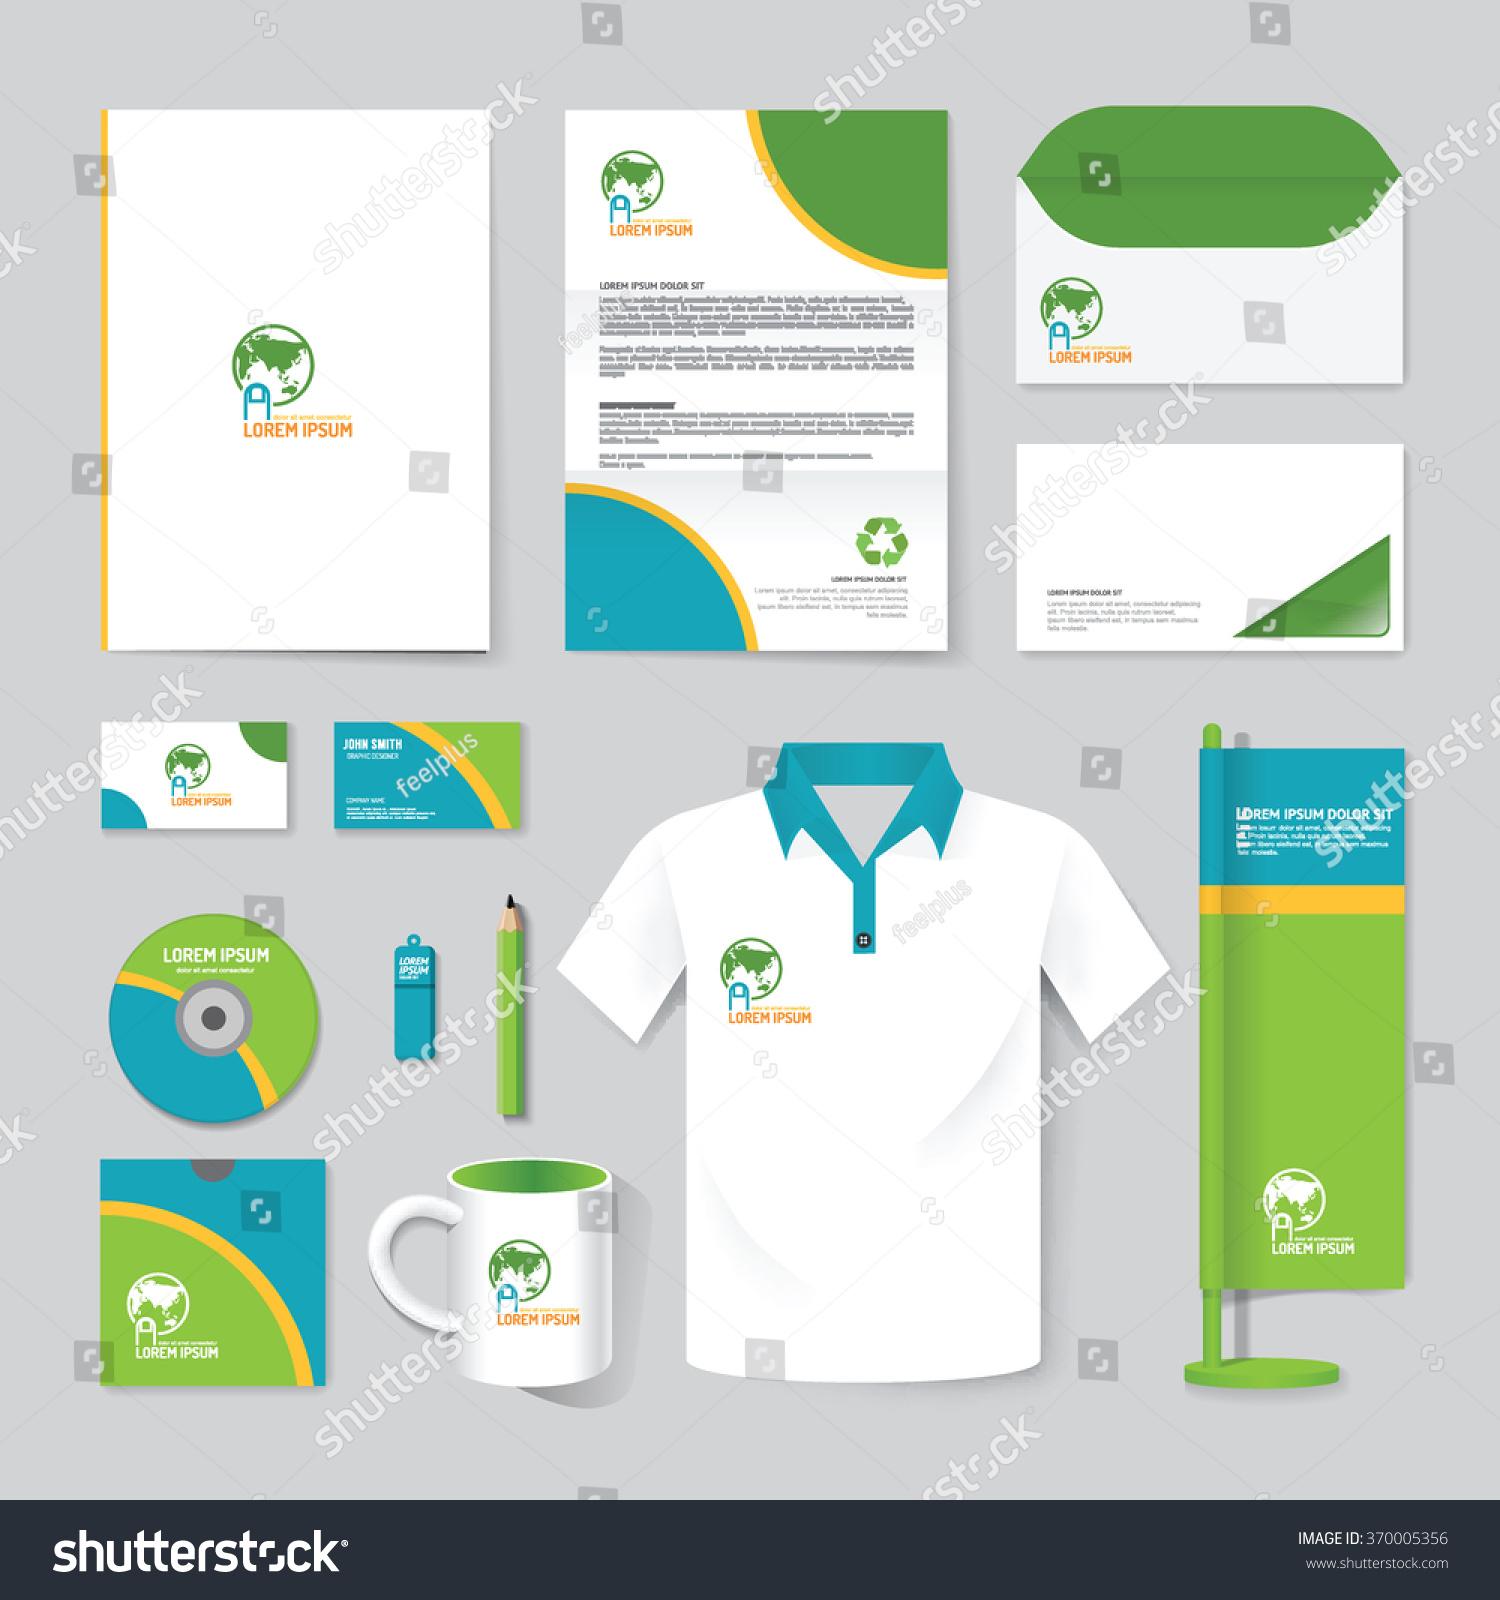 Shirt design template size - Shirt Design Template Size Vector Brochure Flyer Magazine Folder T Shirt Cover Booklet Poster